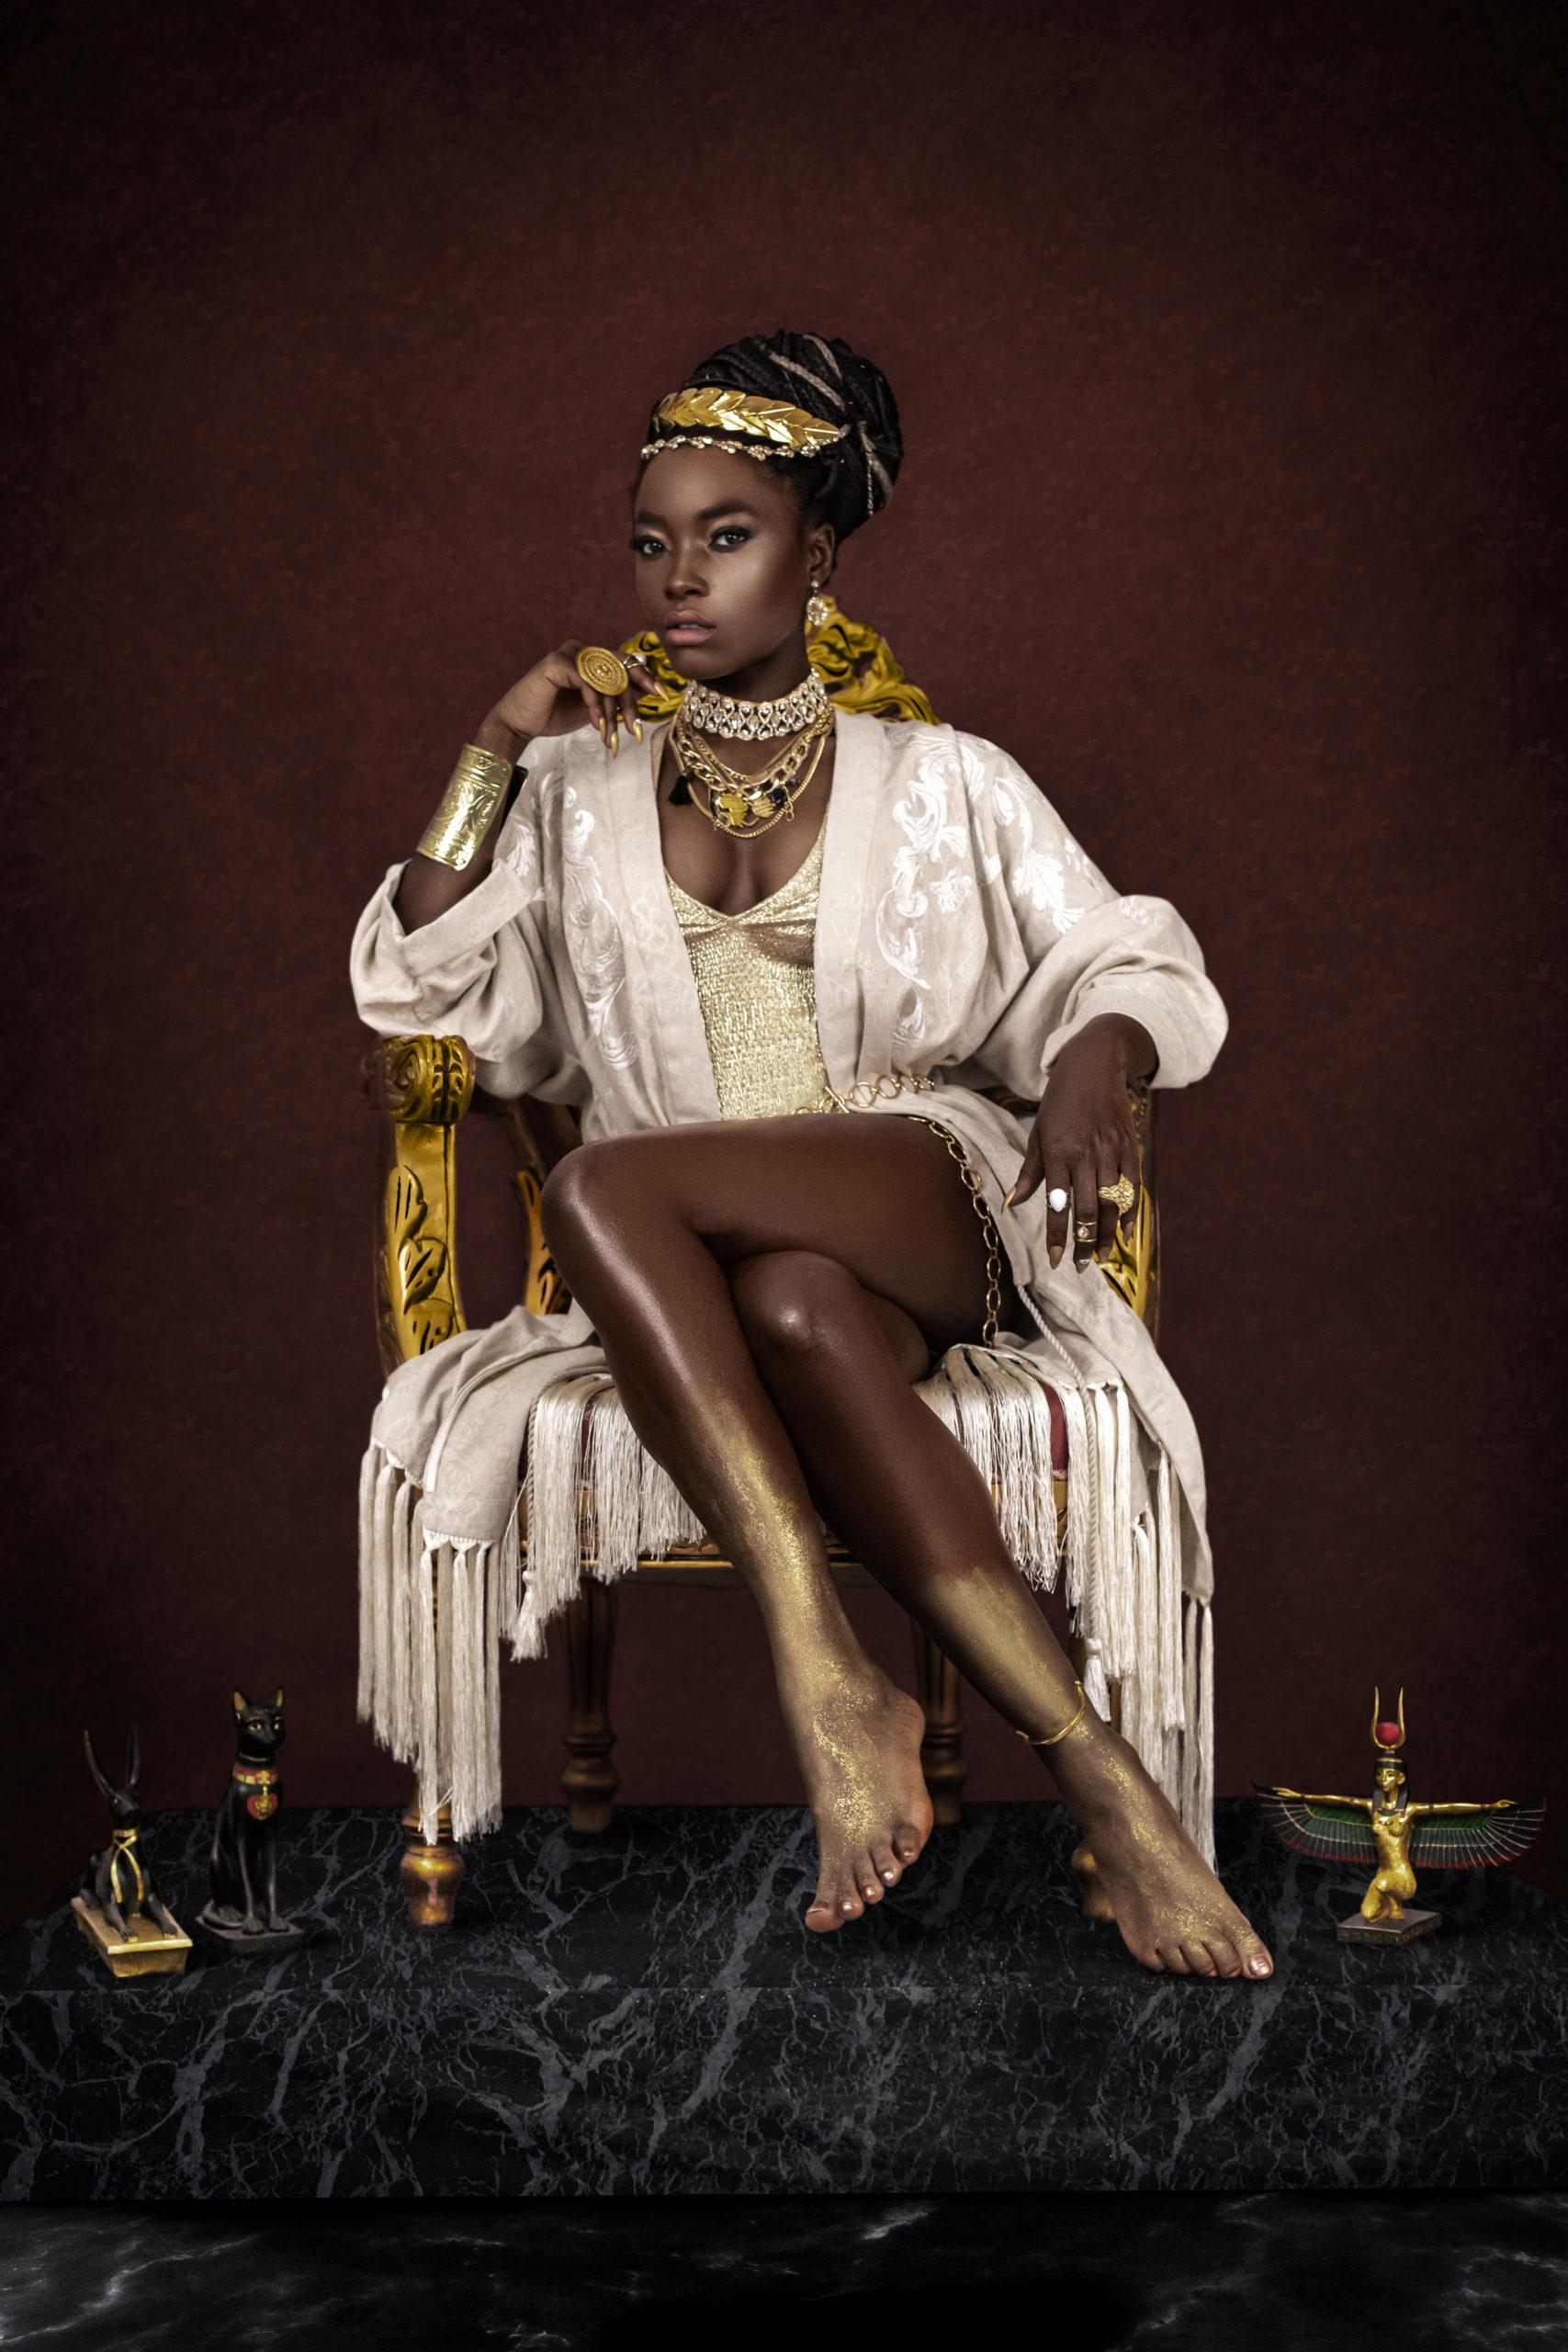 Female Egyptian Pharaoh Sitting On Gold Throne